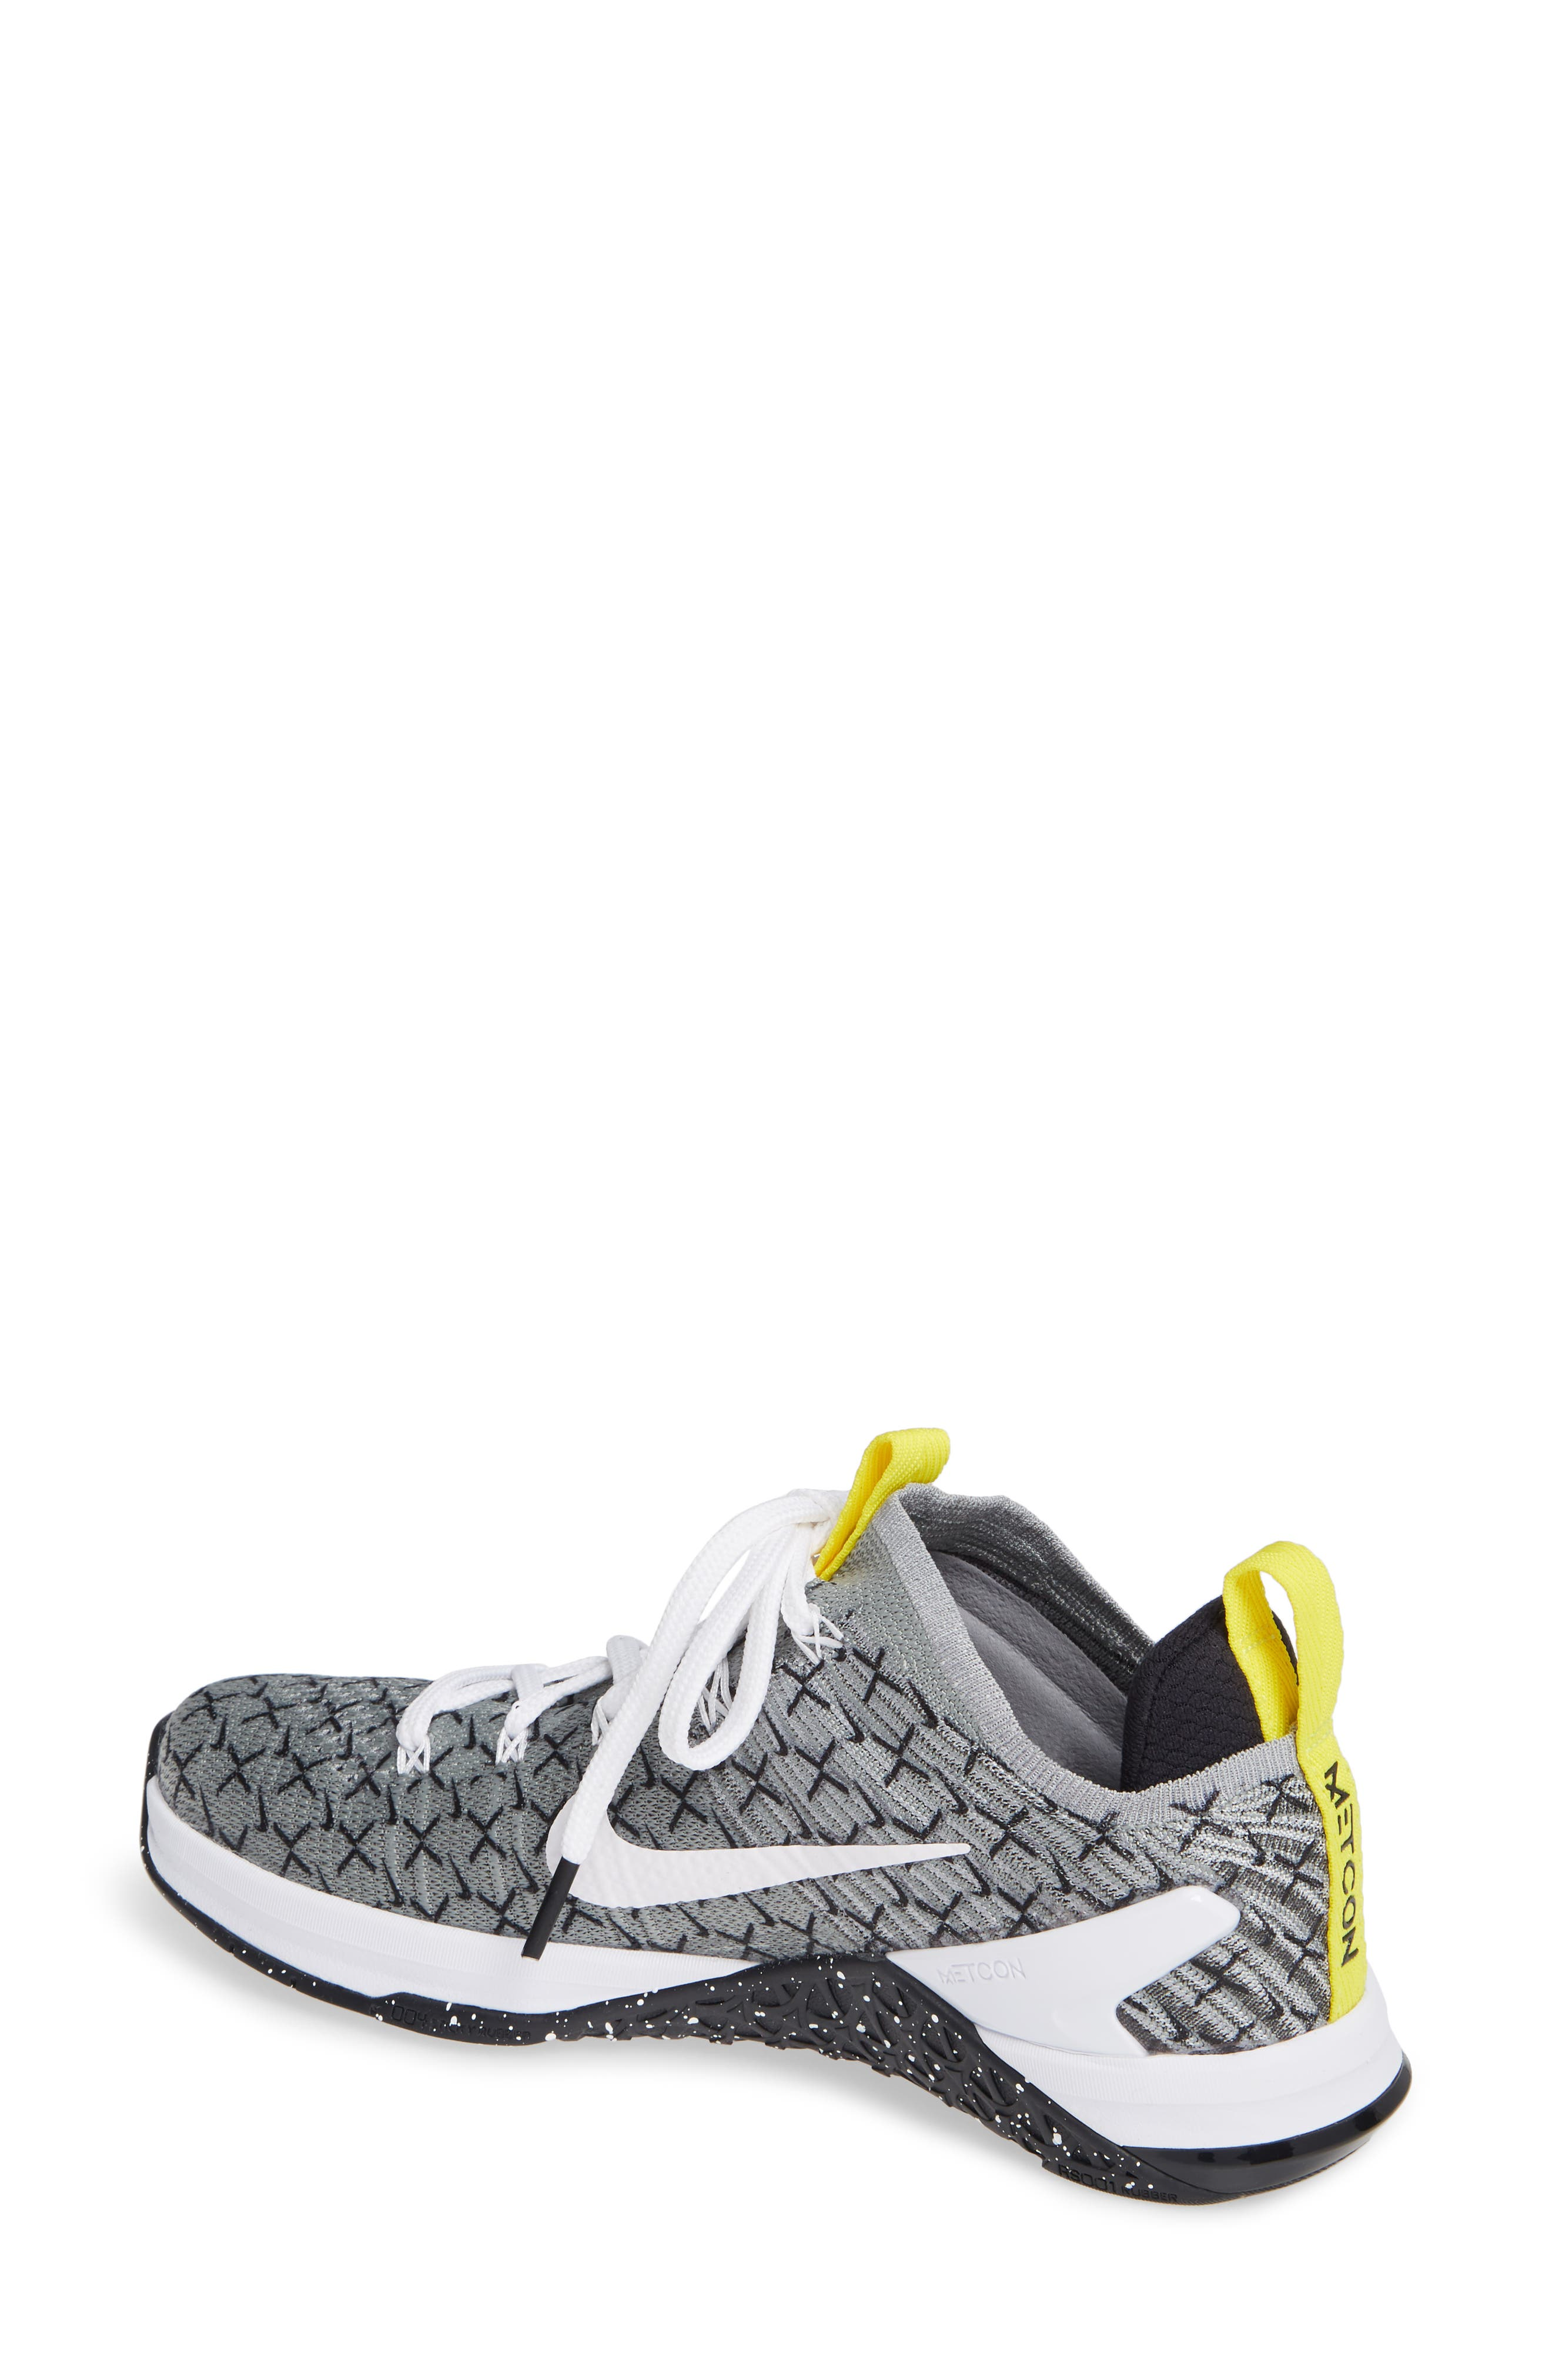 Metcon DSX Flyknit 2 Training Shoe,                             Alternate thumbnail 2, color,                             BLACK/ WHITE/ DYNAMIC YELLOW